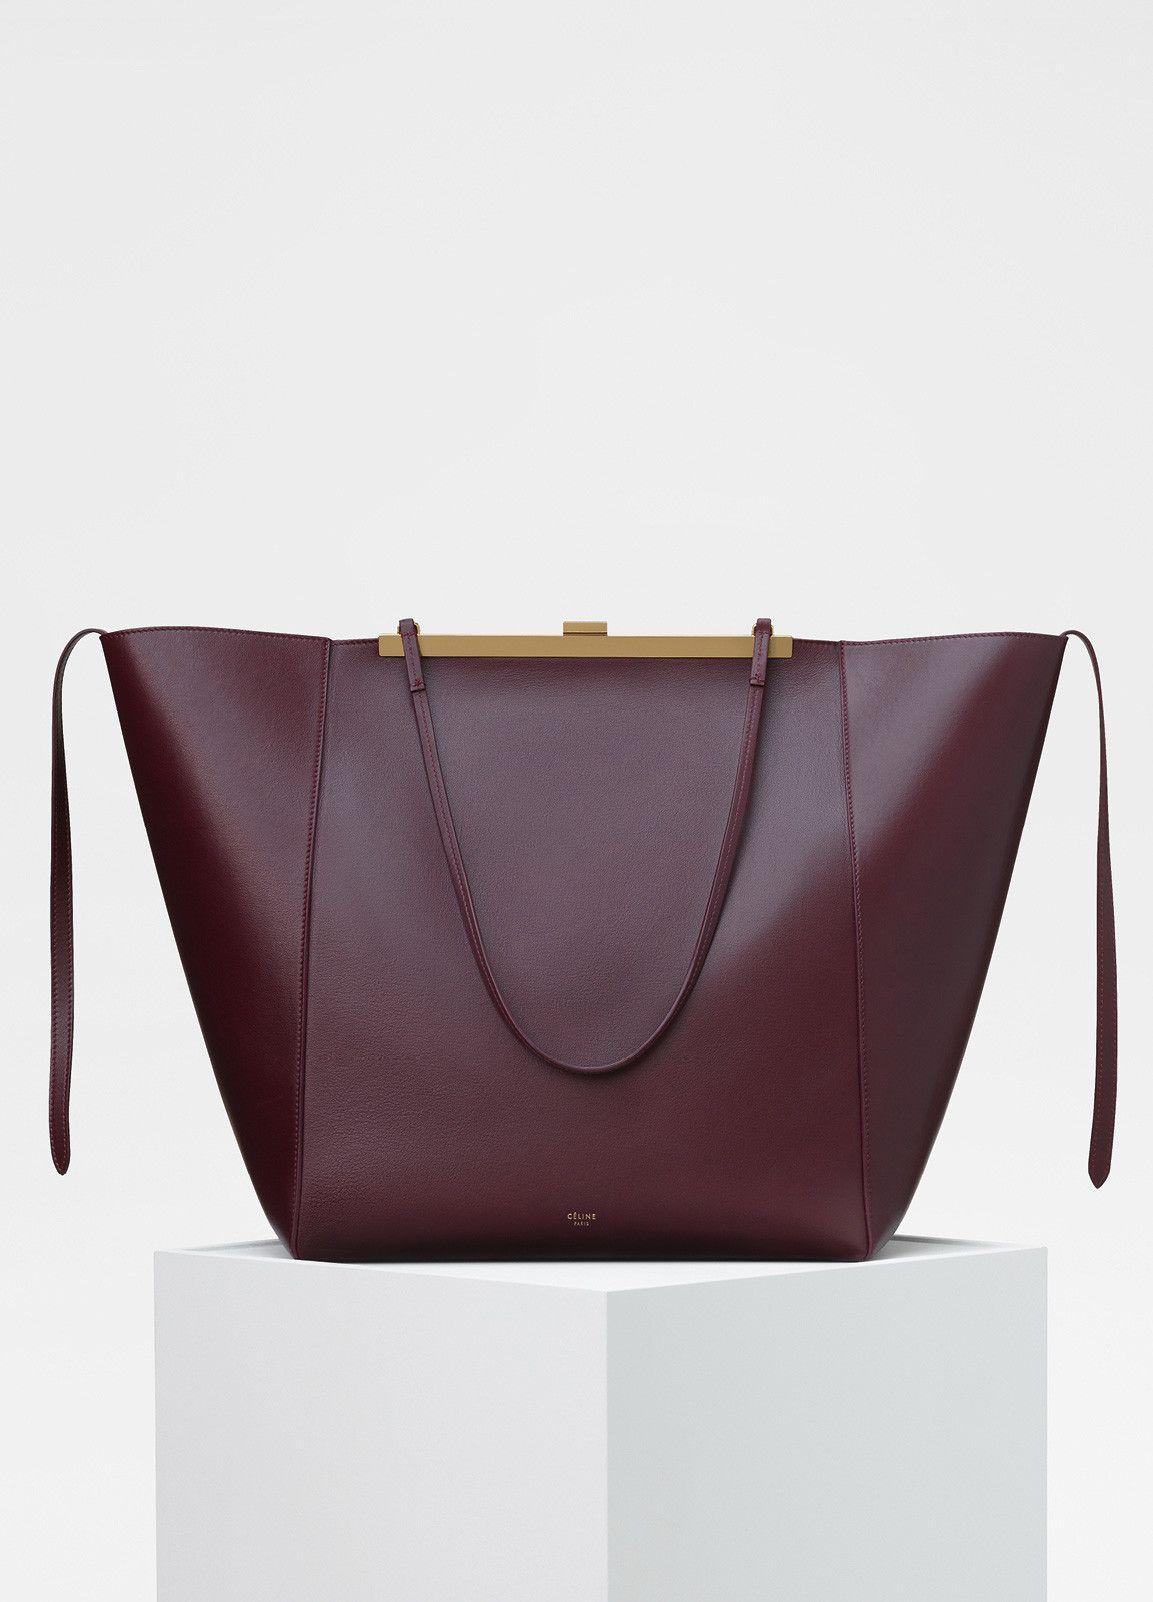 Cabas Clasp Bag in Smooth Calfskin - Céline | The \